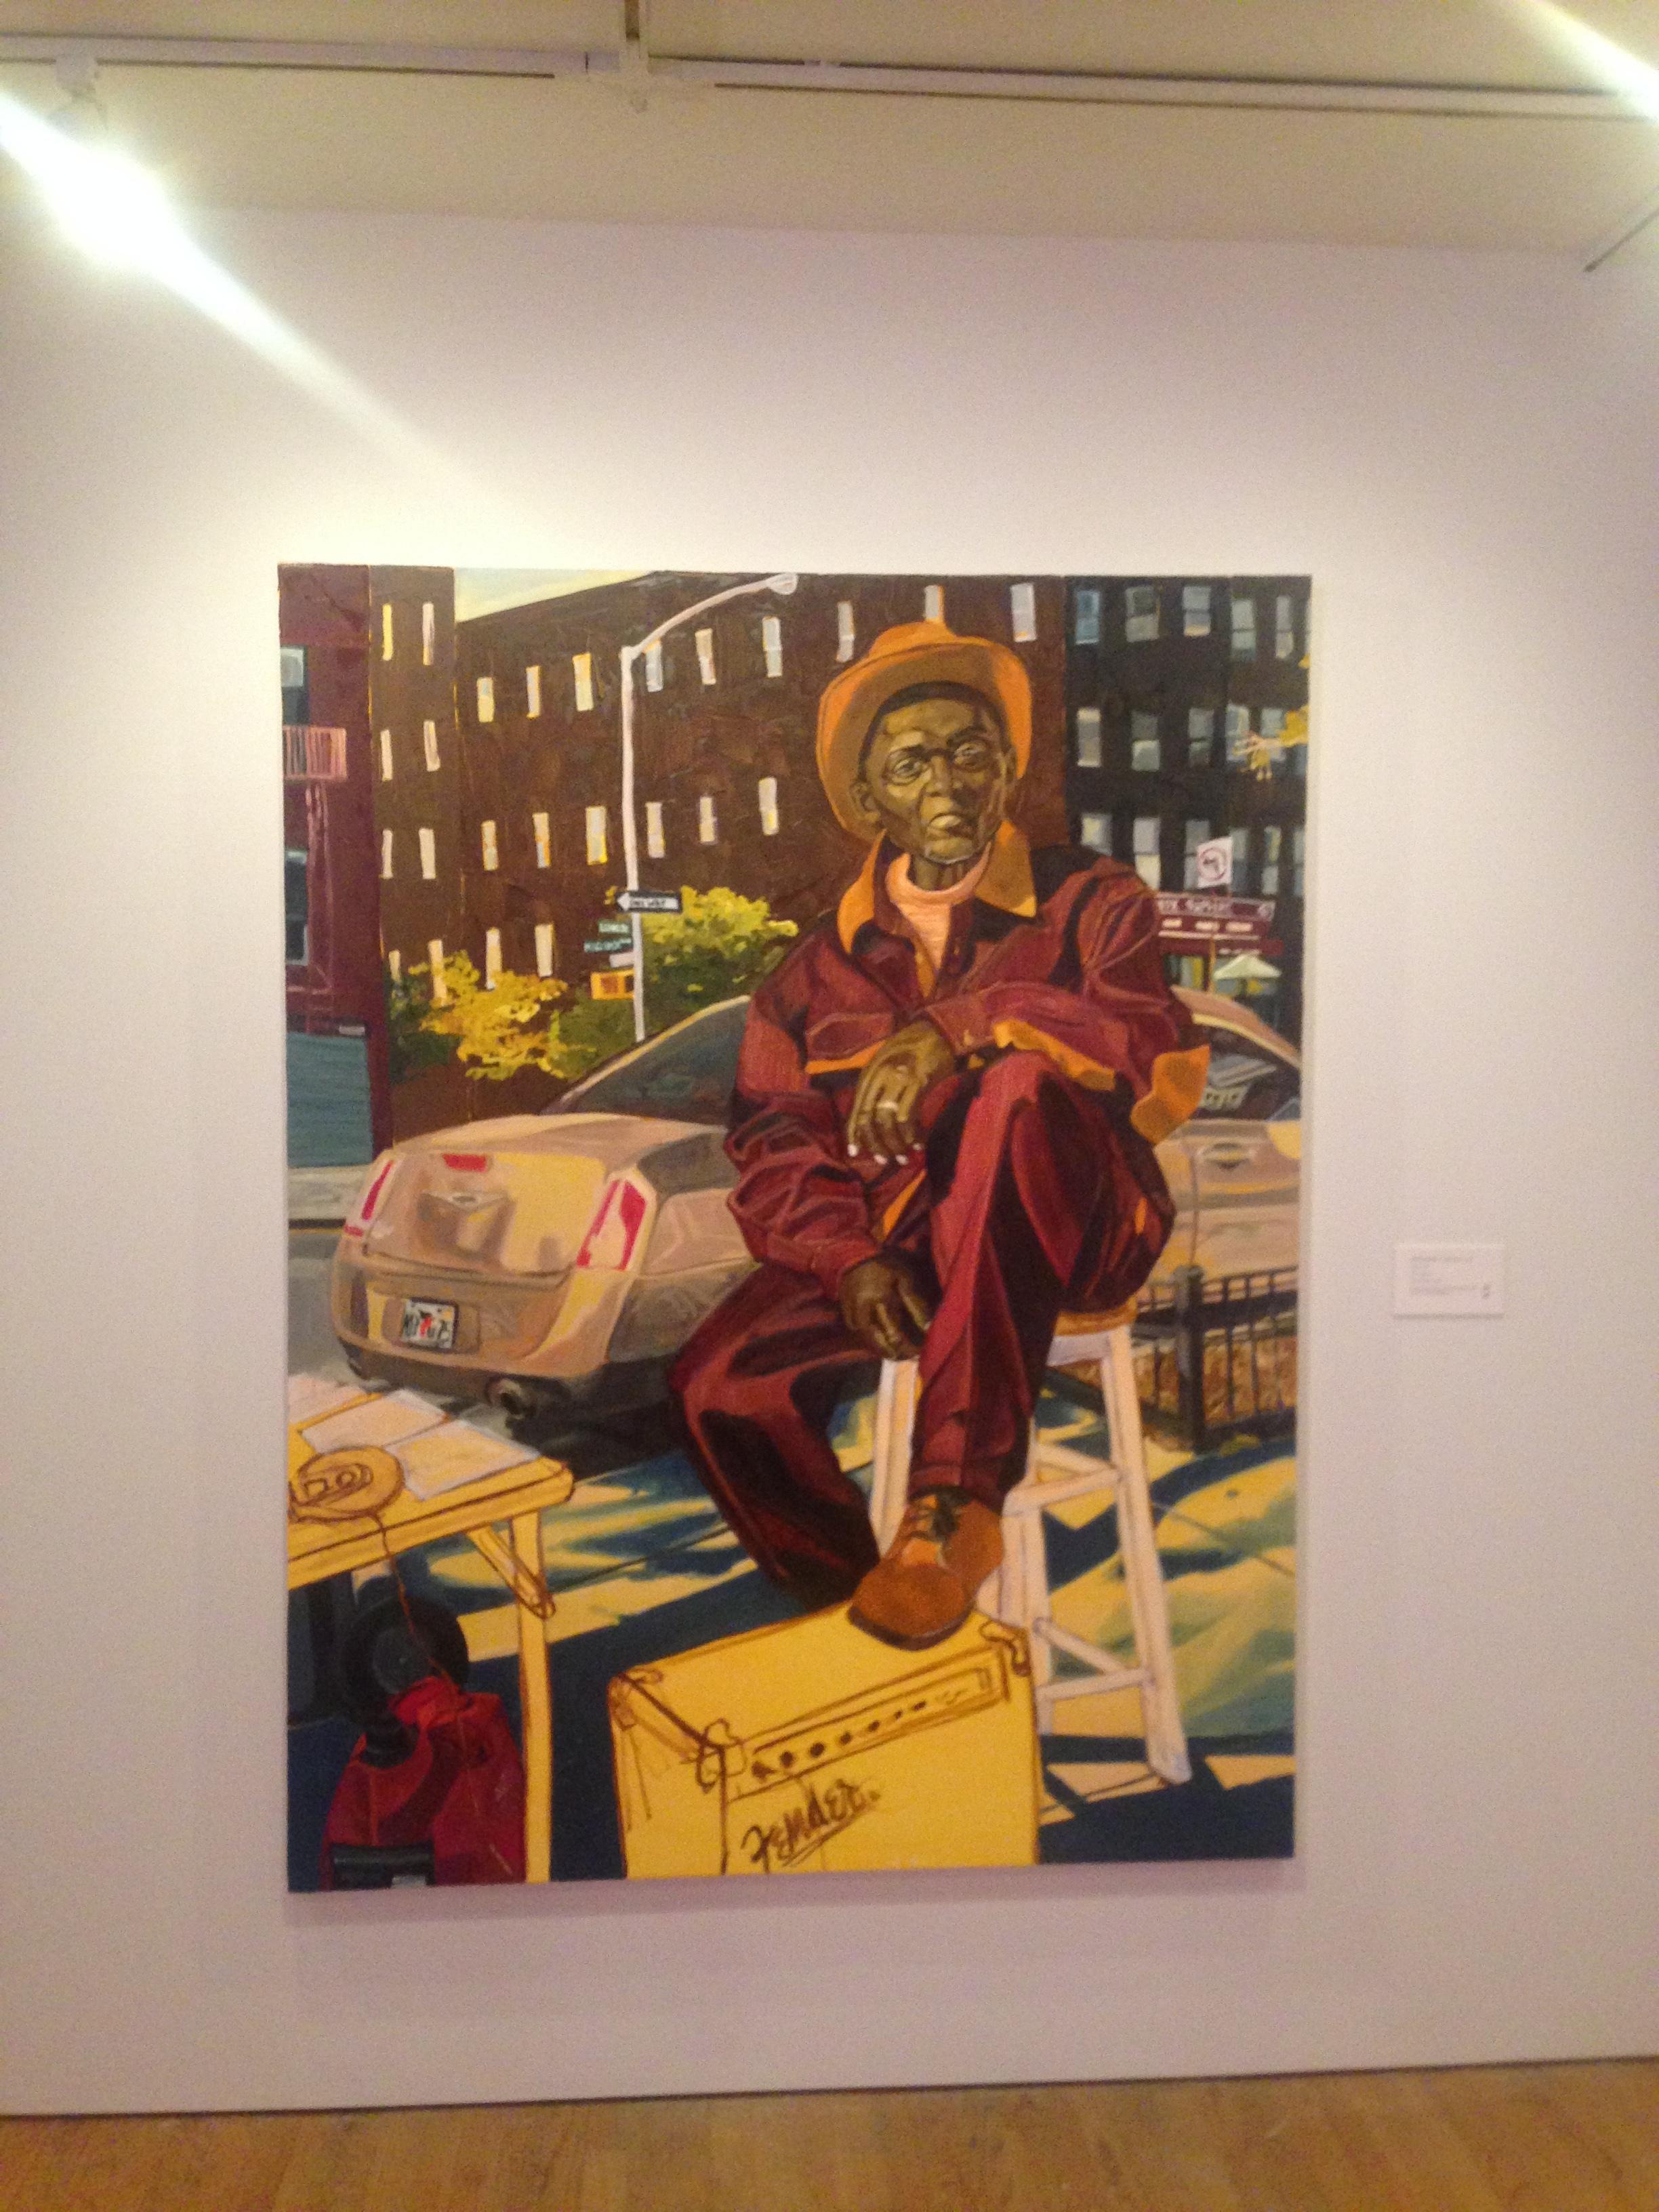 'James', Jordan Casteel, part of 'Tenses', Studio Museum in Harlem, August 2016.